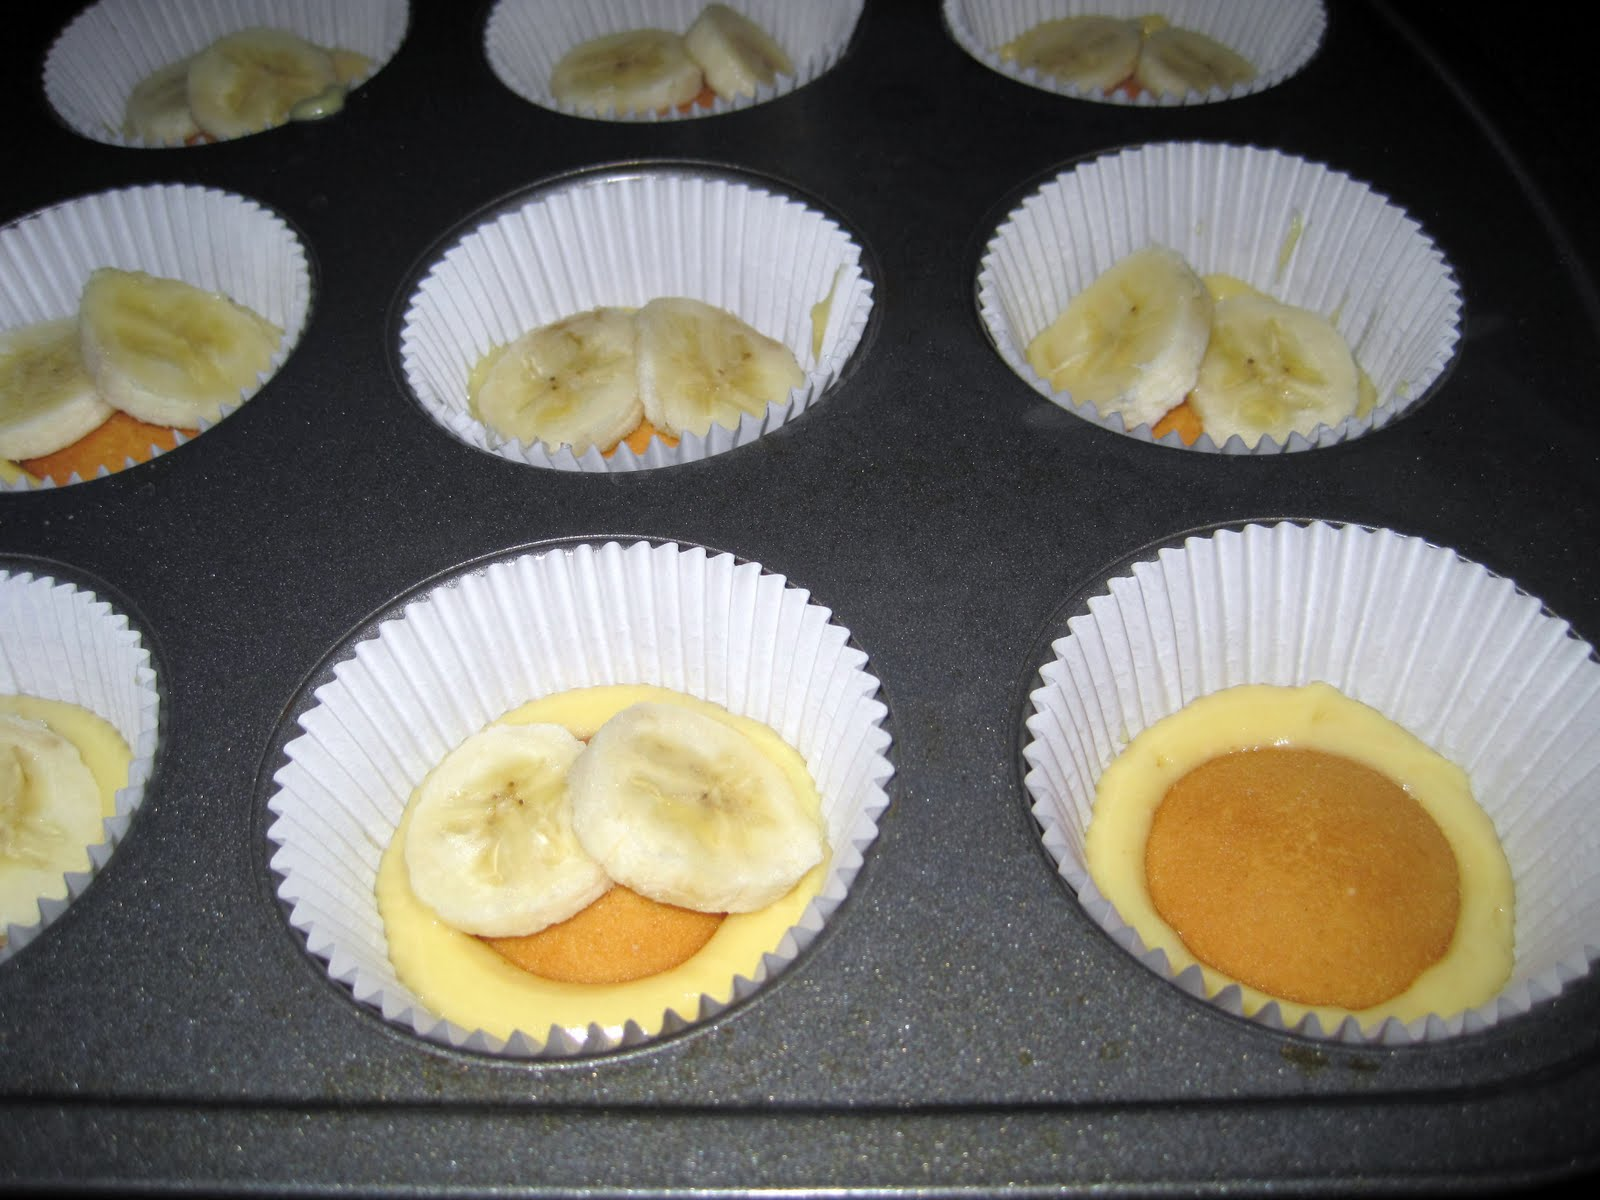 How To Make Banana Cupcakes With Cake Mix